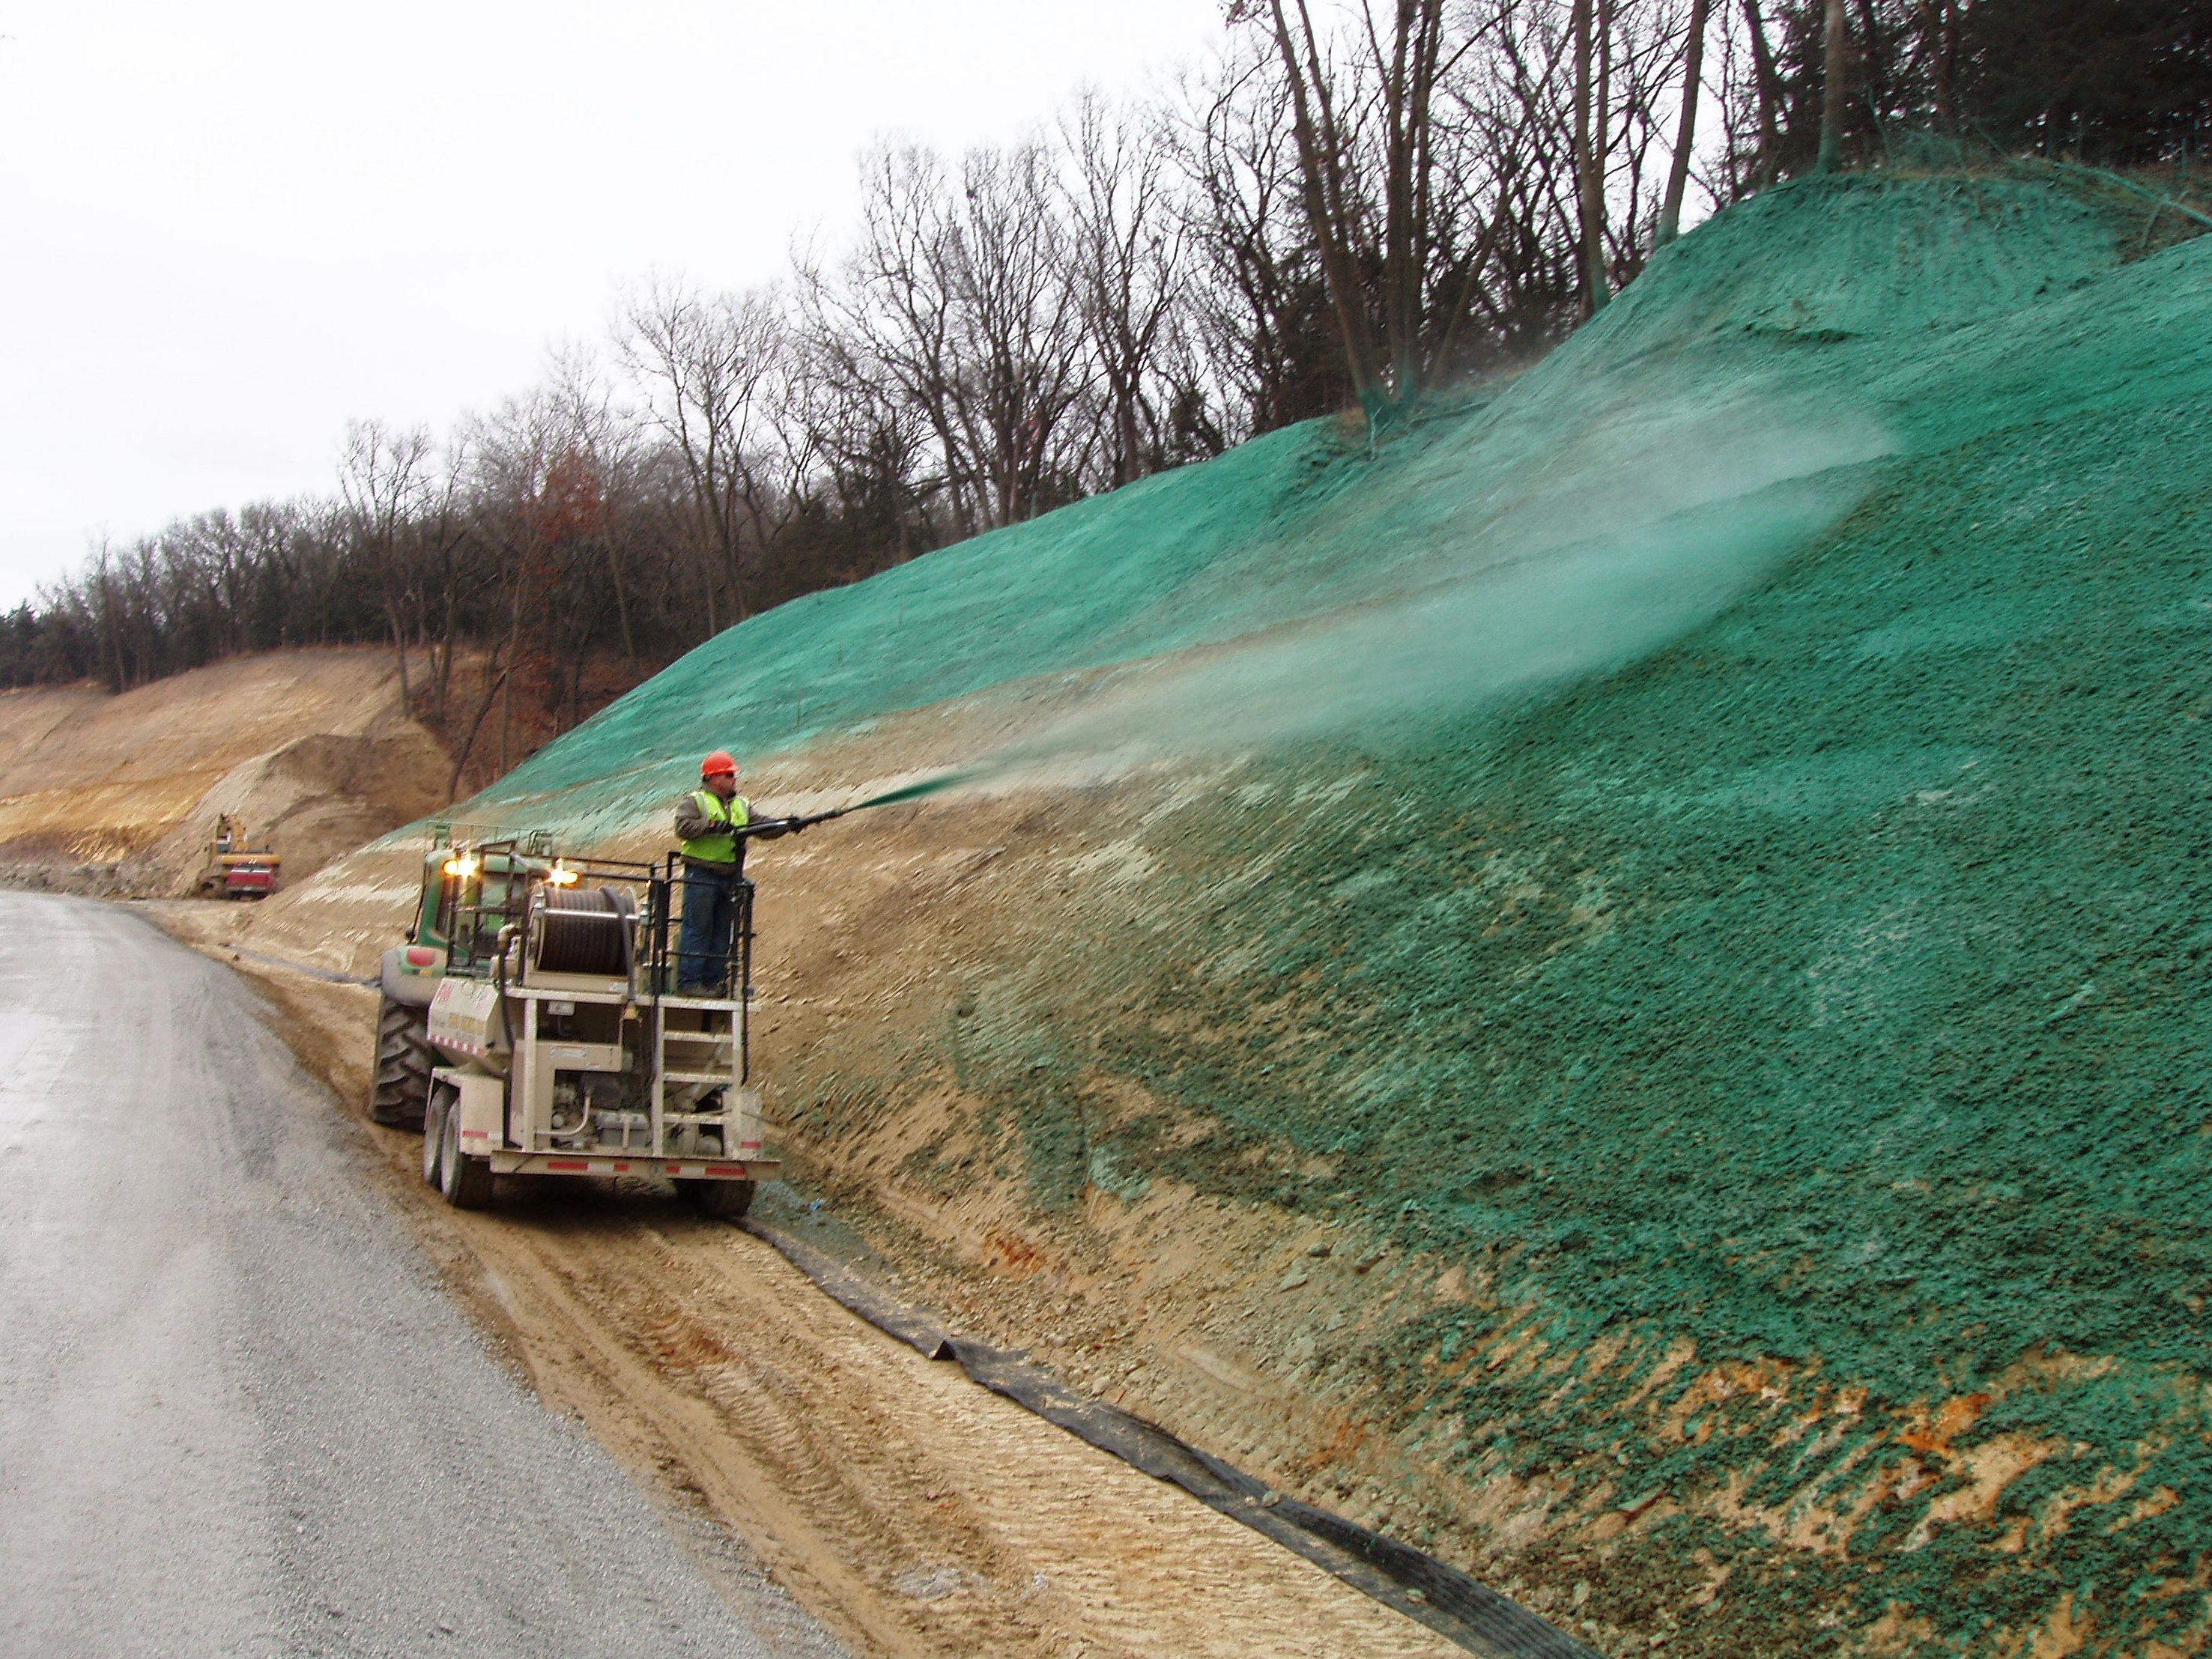 0822 600 700 80 Supplier Mesin Hydroseeding Terbaik Erosion Landscape Design Erosion Control